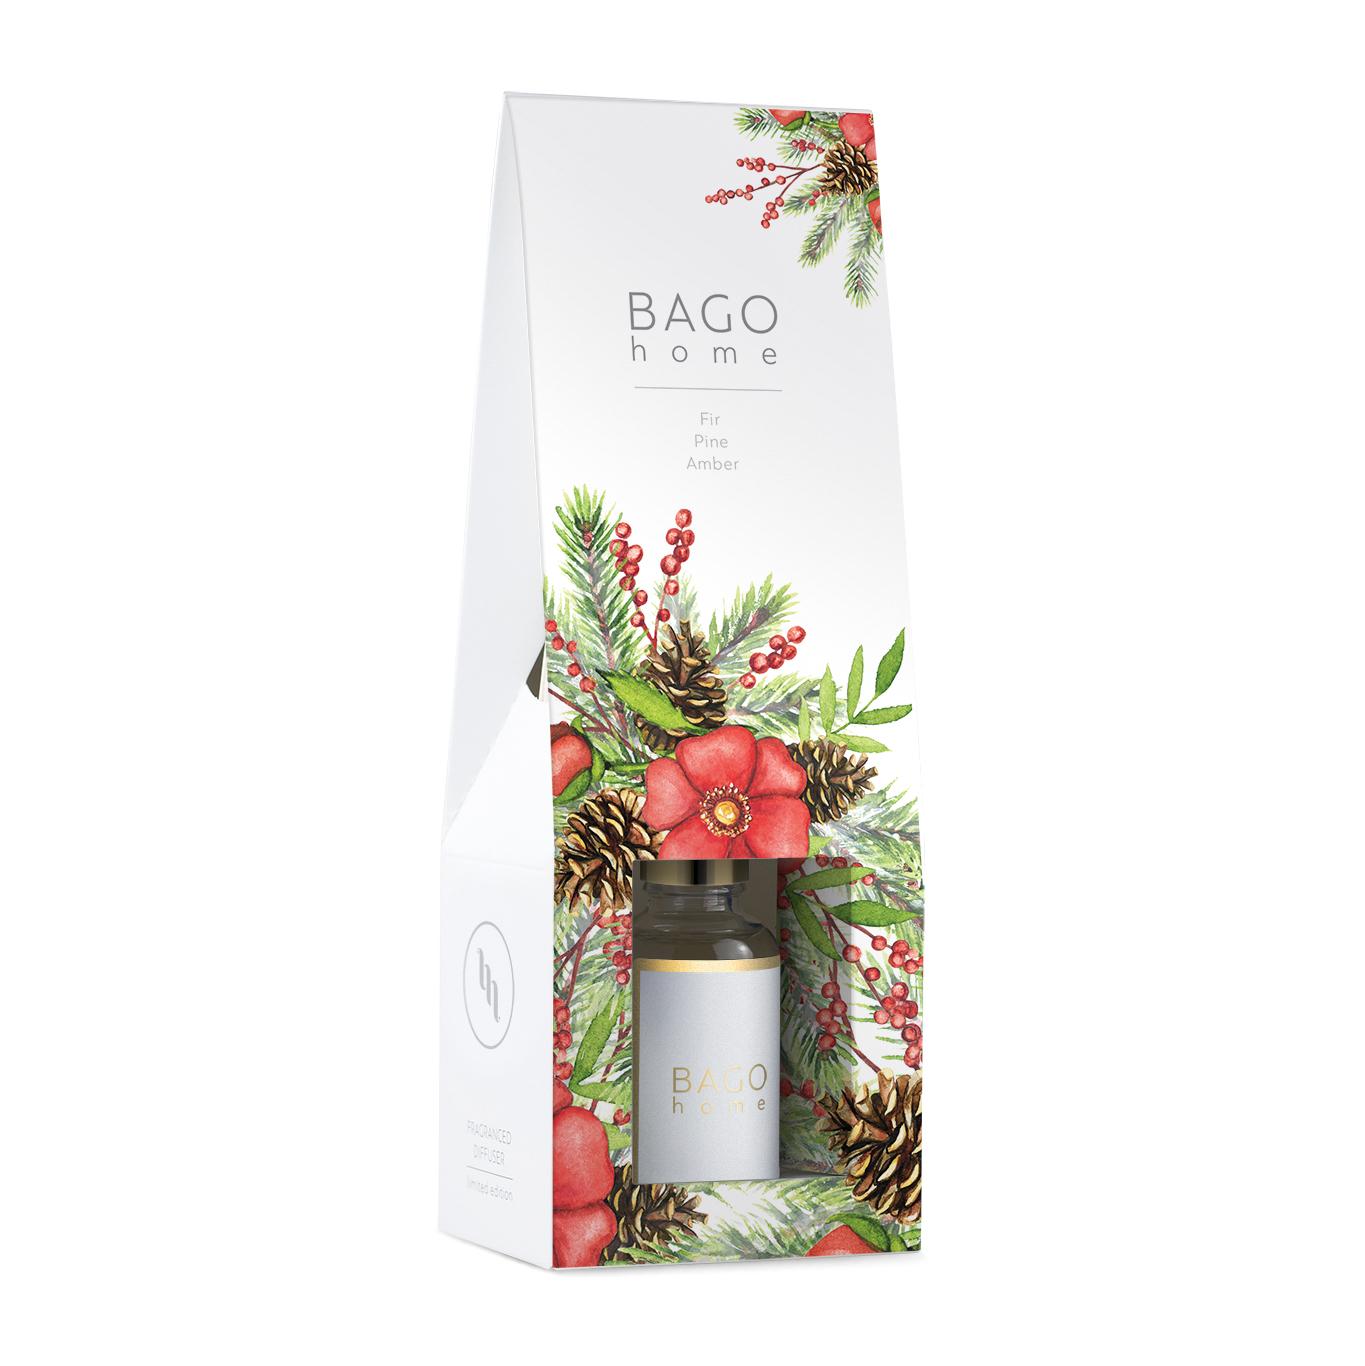 Диффузор ароматический BAGO home Зимняя ель 30 мл